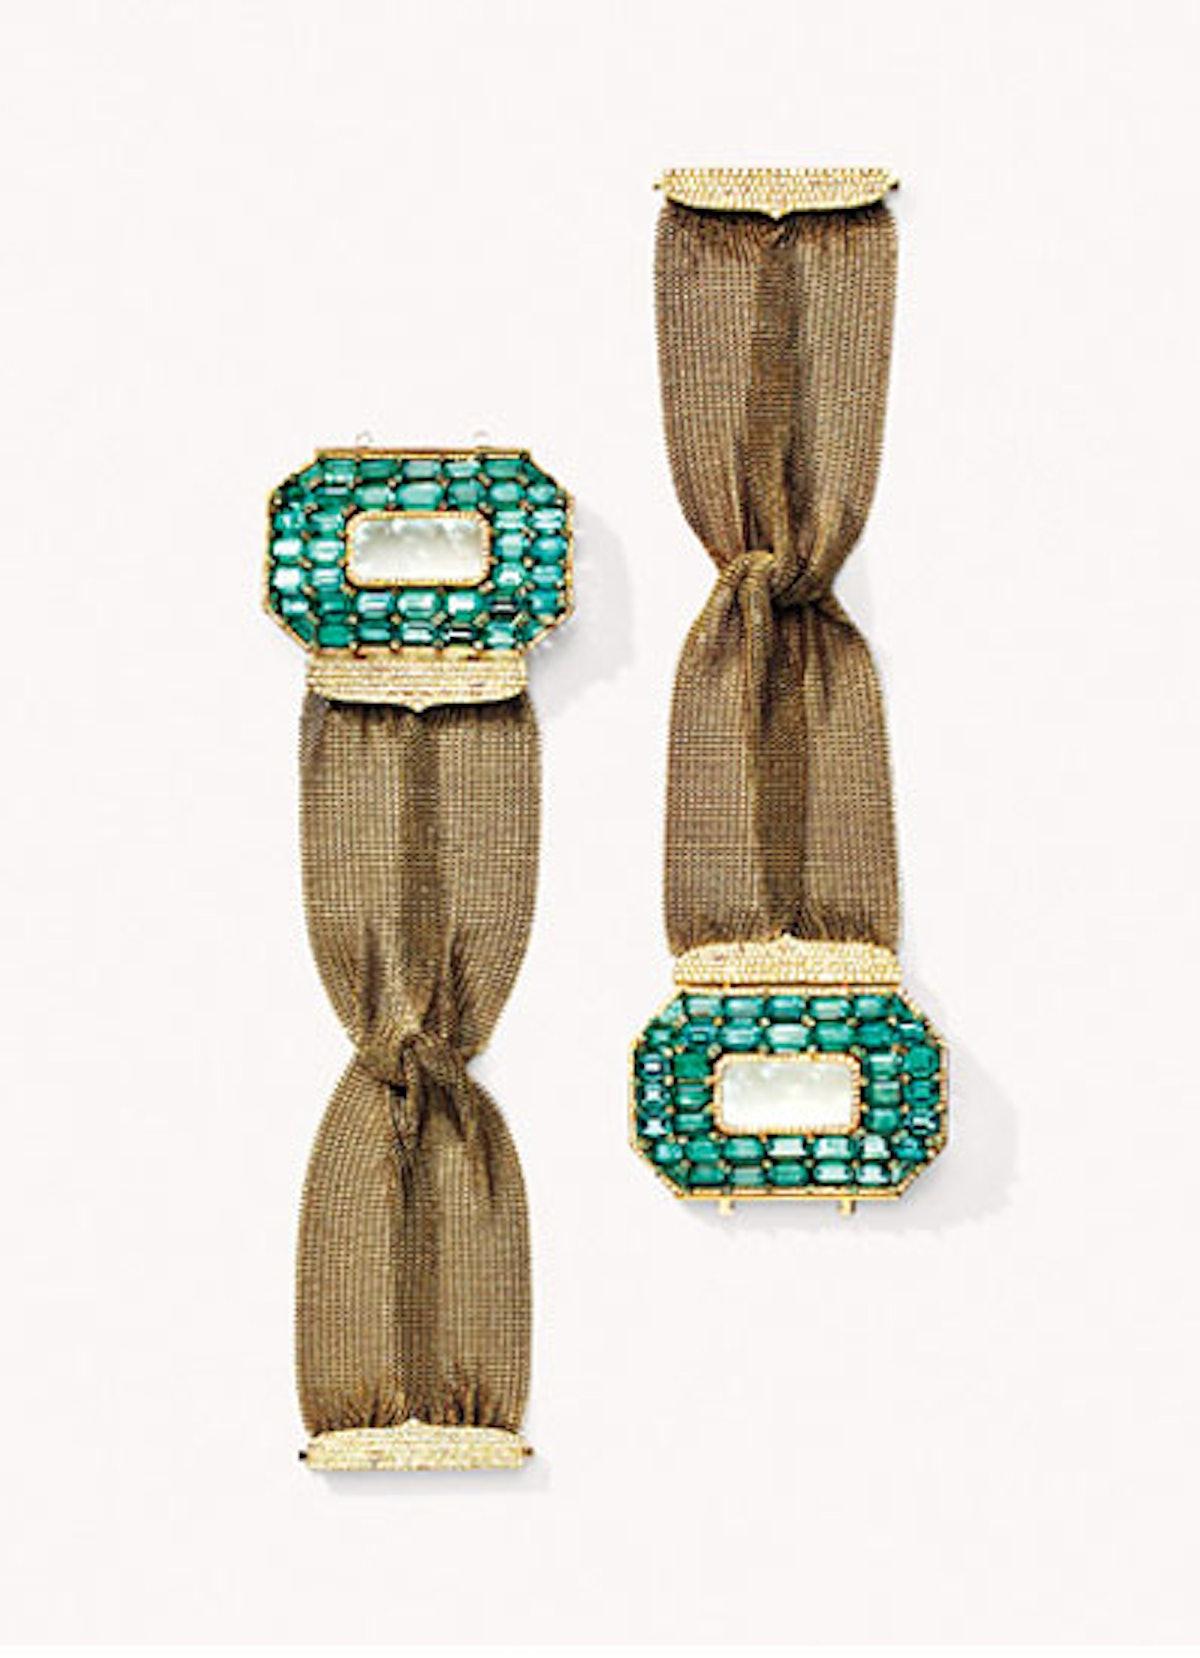 acss-claudia-mata-jewelry-picks-03-v.jpg